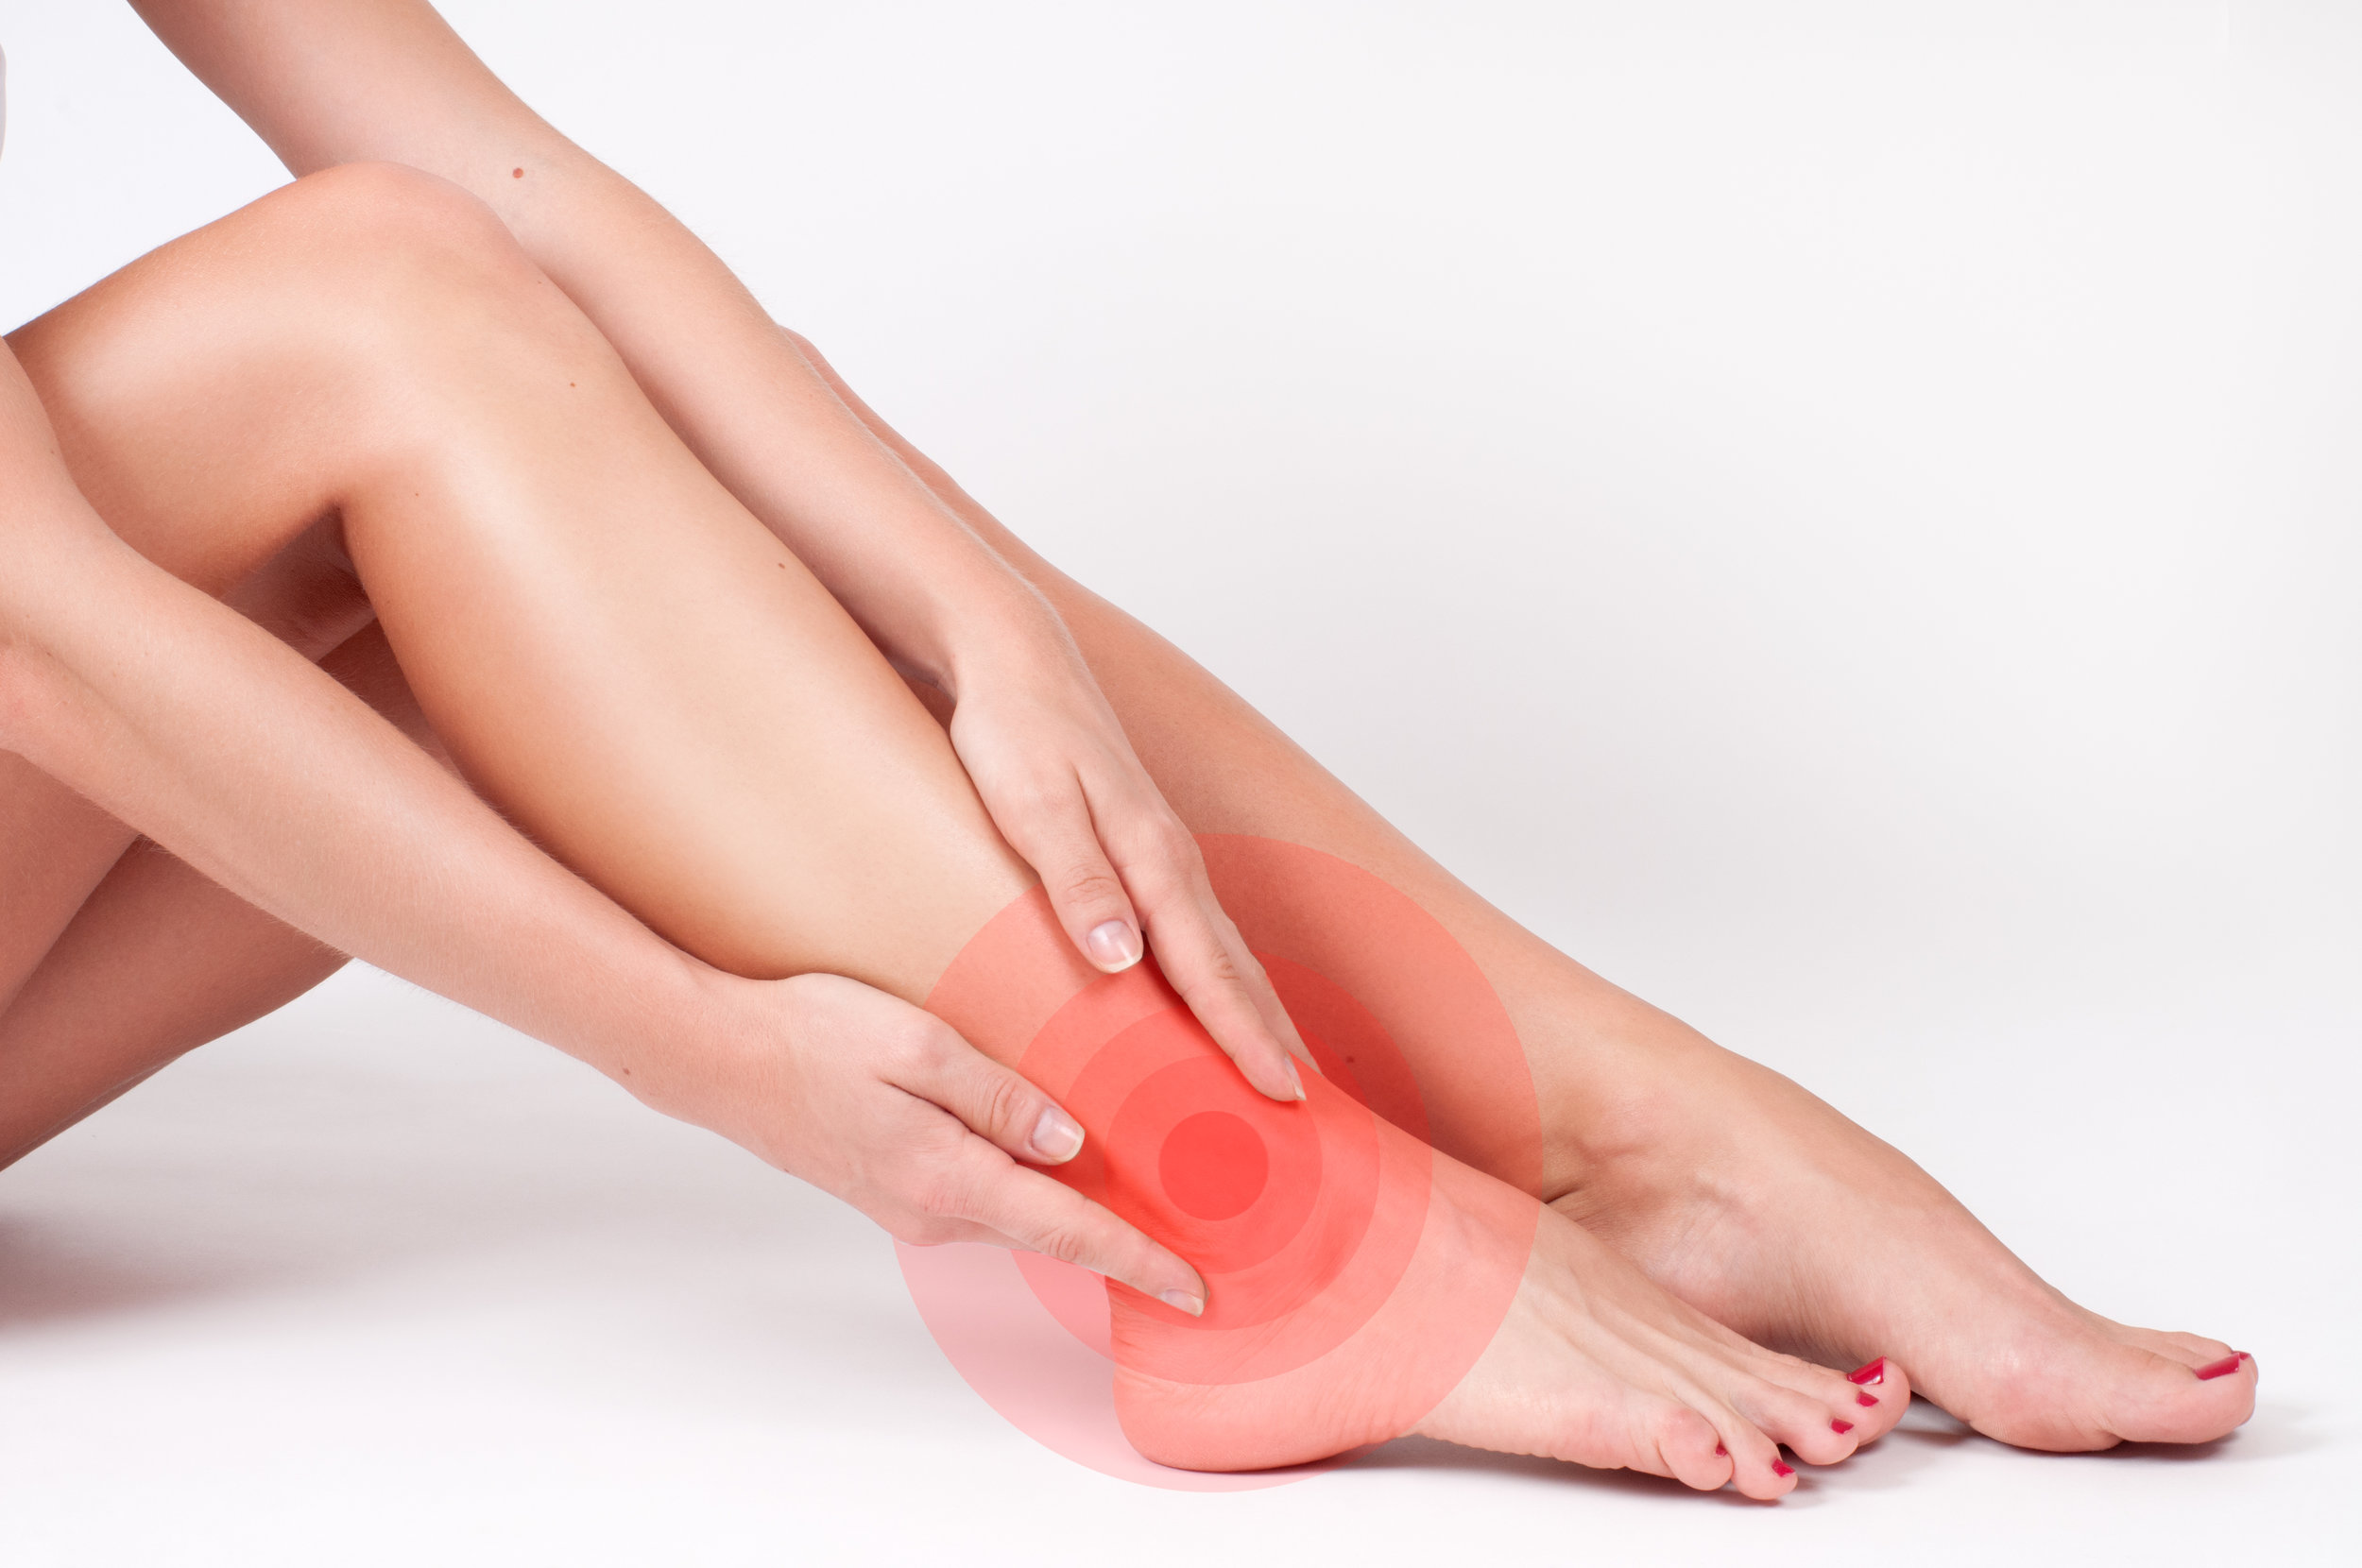 bigstock-Ankle-Pain-Female-Legs-Woman-193093075.jpg